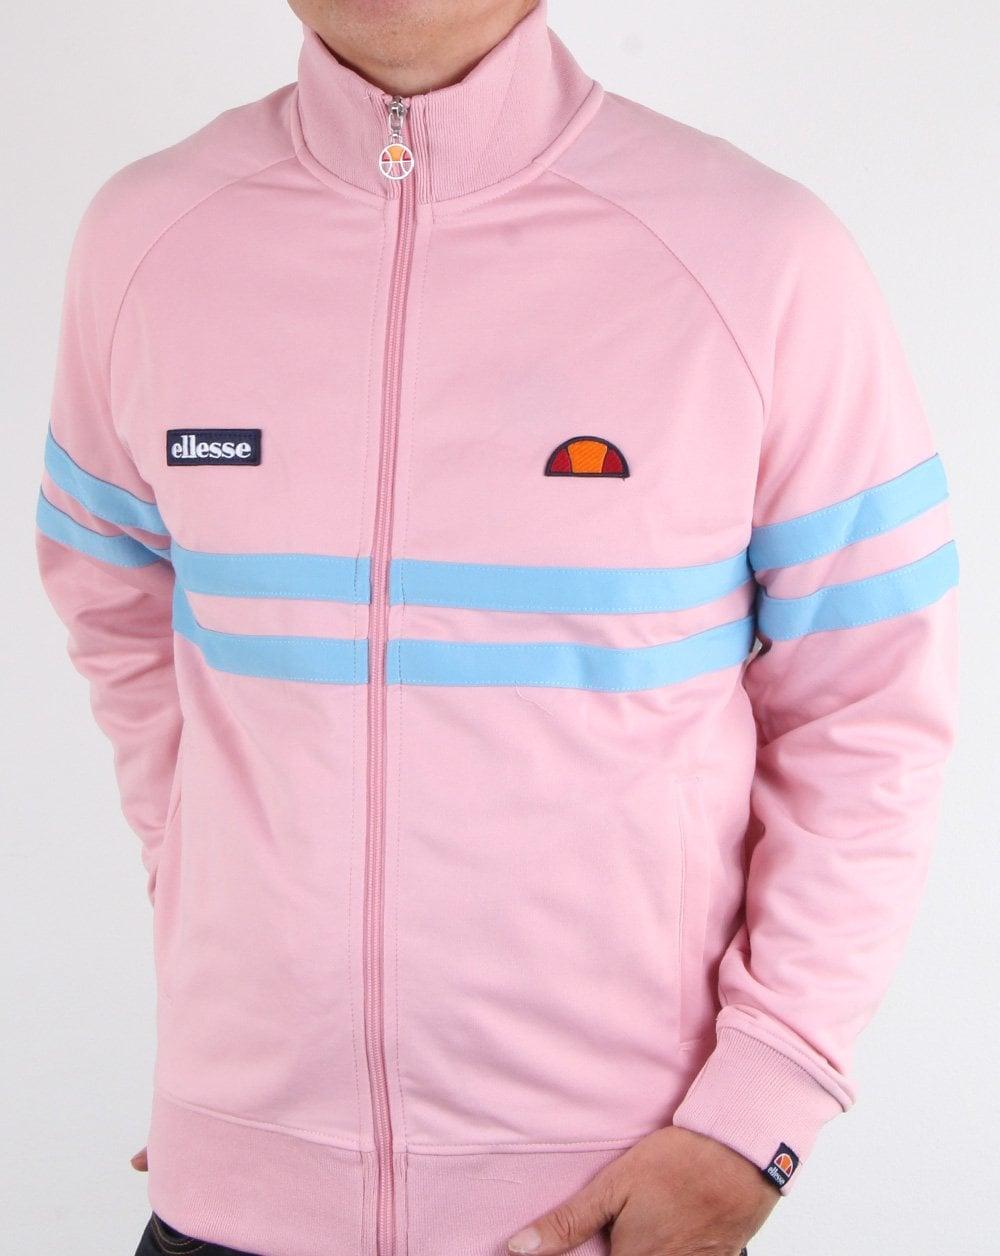 d452138a Ellesse Rimini Track Top Light Pink